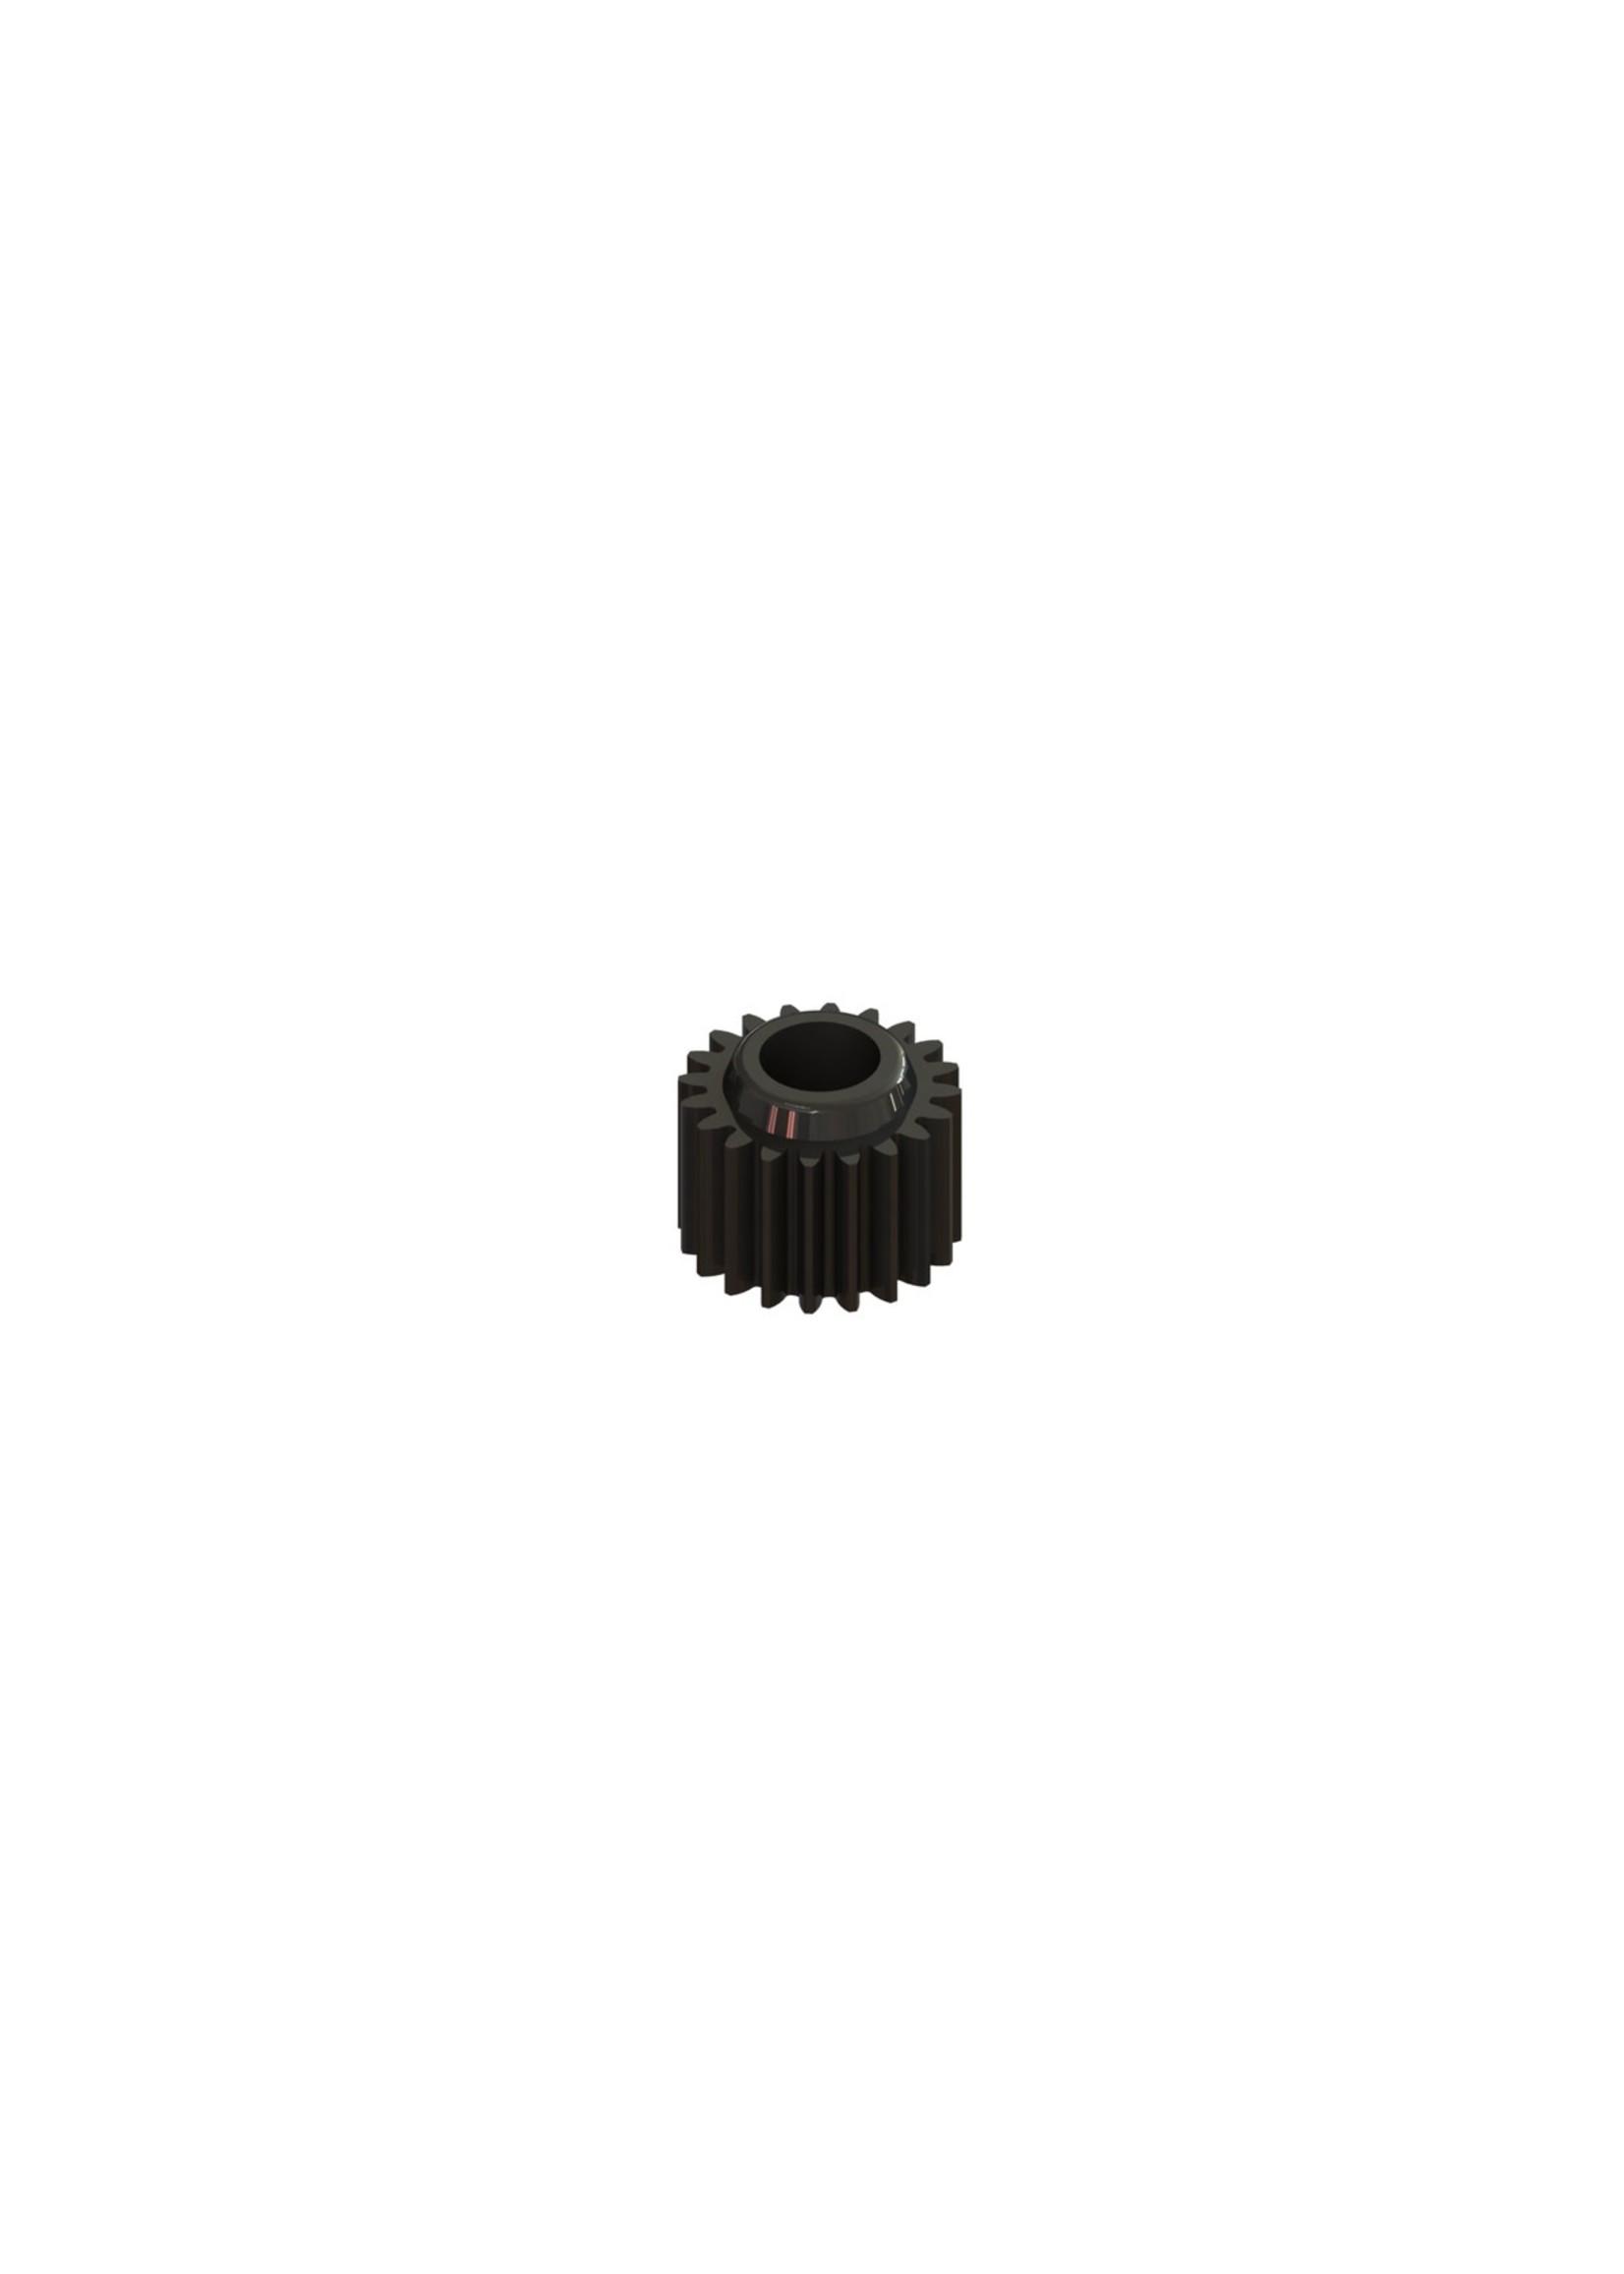 ARRMA AR310016 Arrma Idler Gear 20T Metal